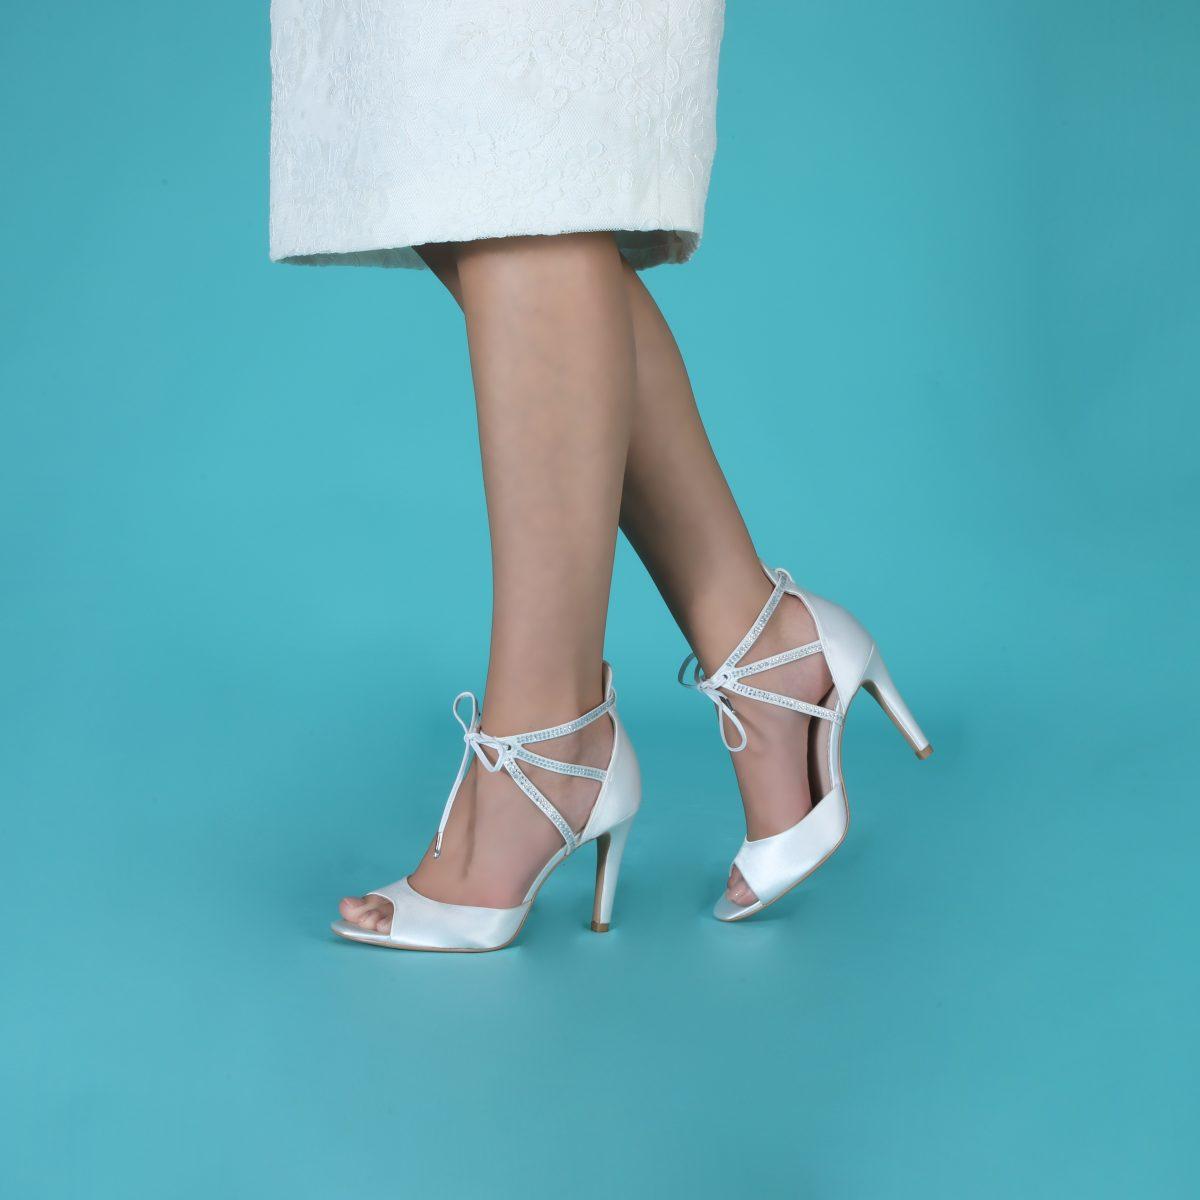 Perfect Bridal Kelis Shoes - Ivory Satin 4